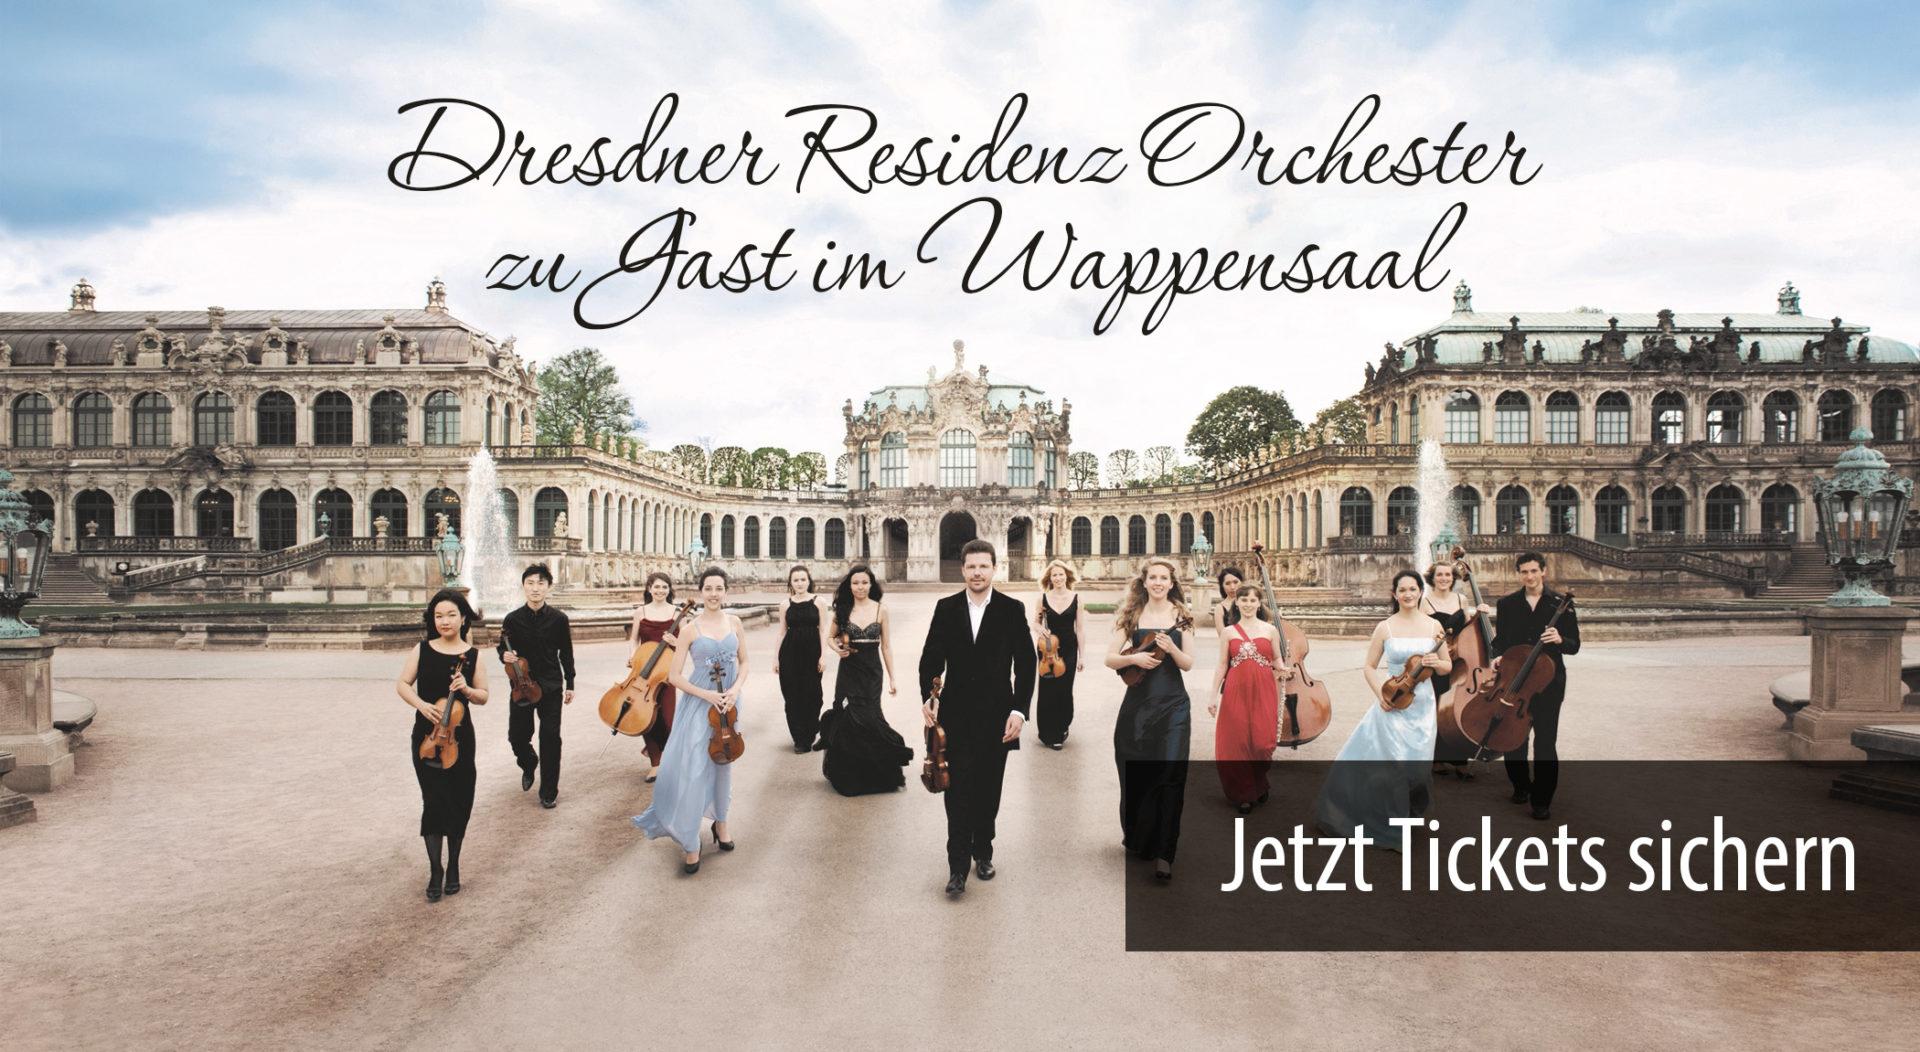 Dresdner Residenz Orchester zu Gast im Wappensaal